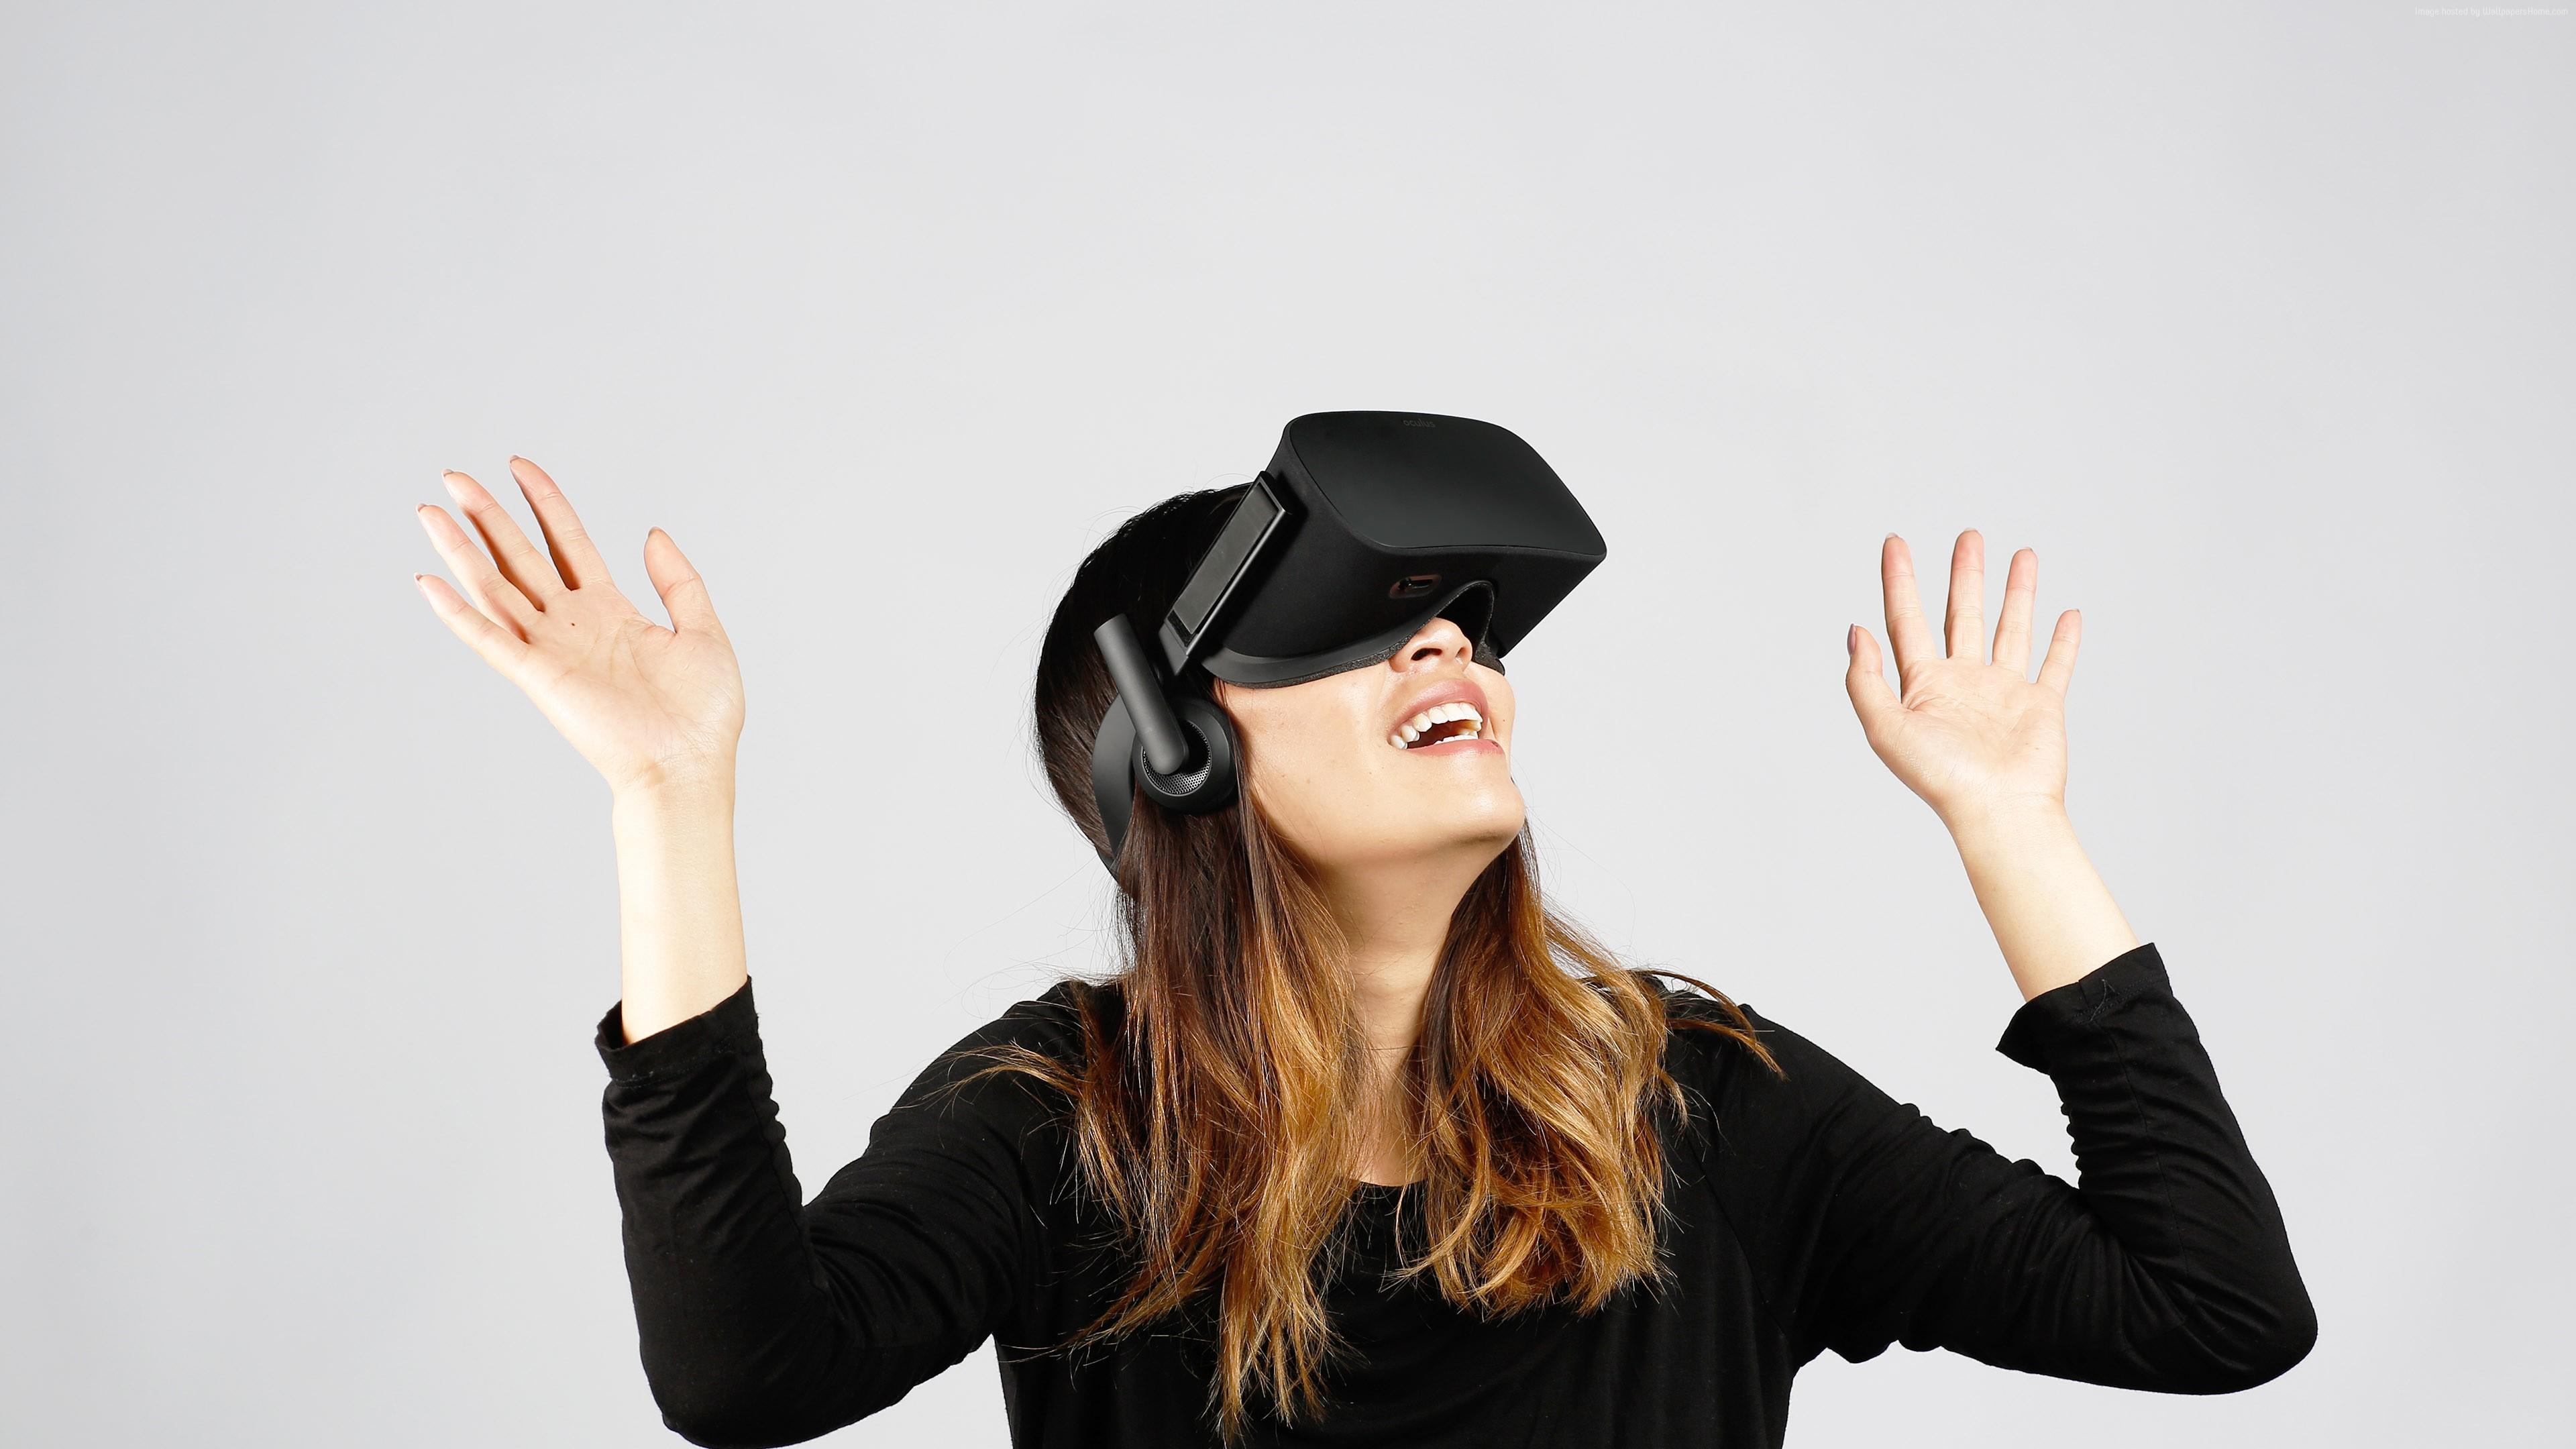 oculus-rift-3840x2160-oculus-touch-virtual-reality-vr-headset-10192